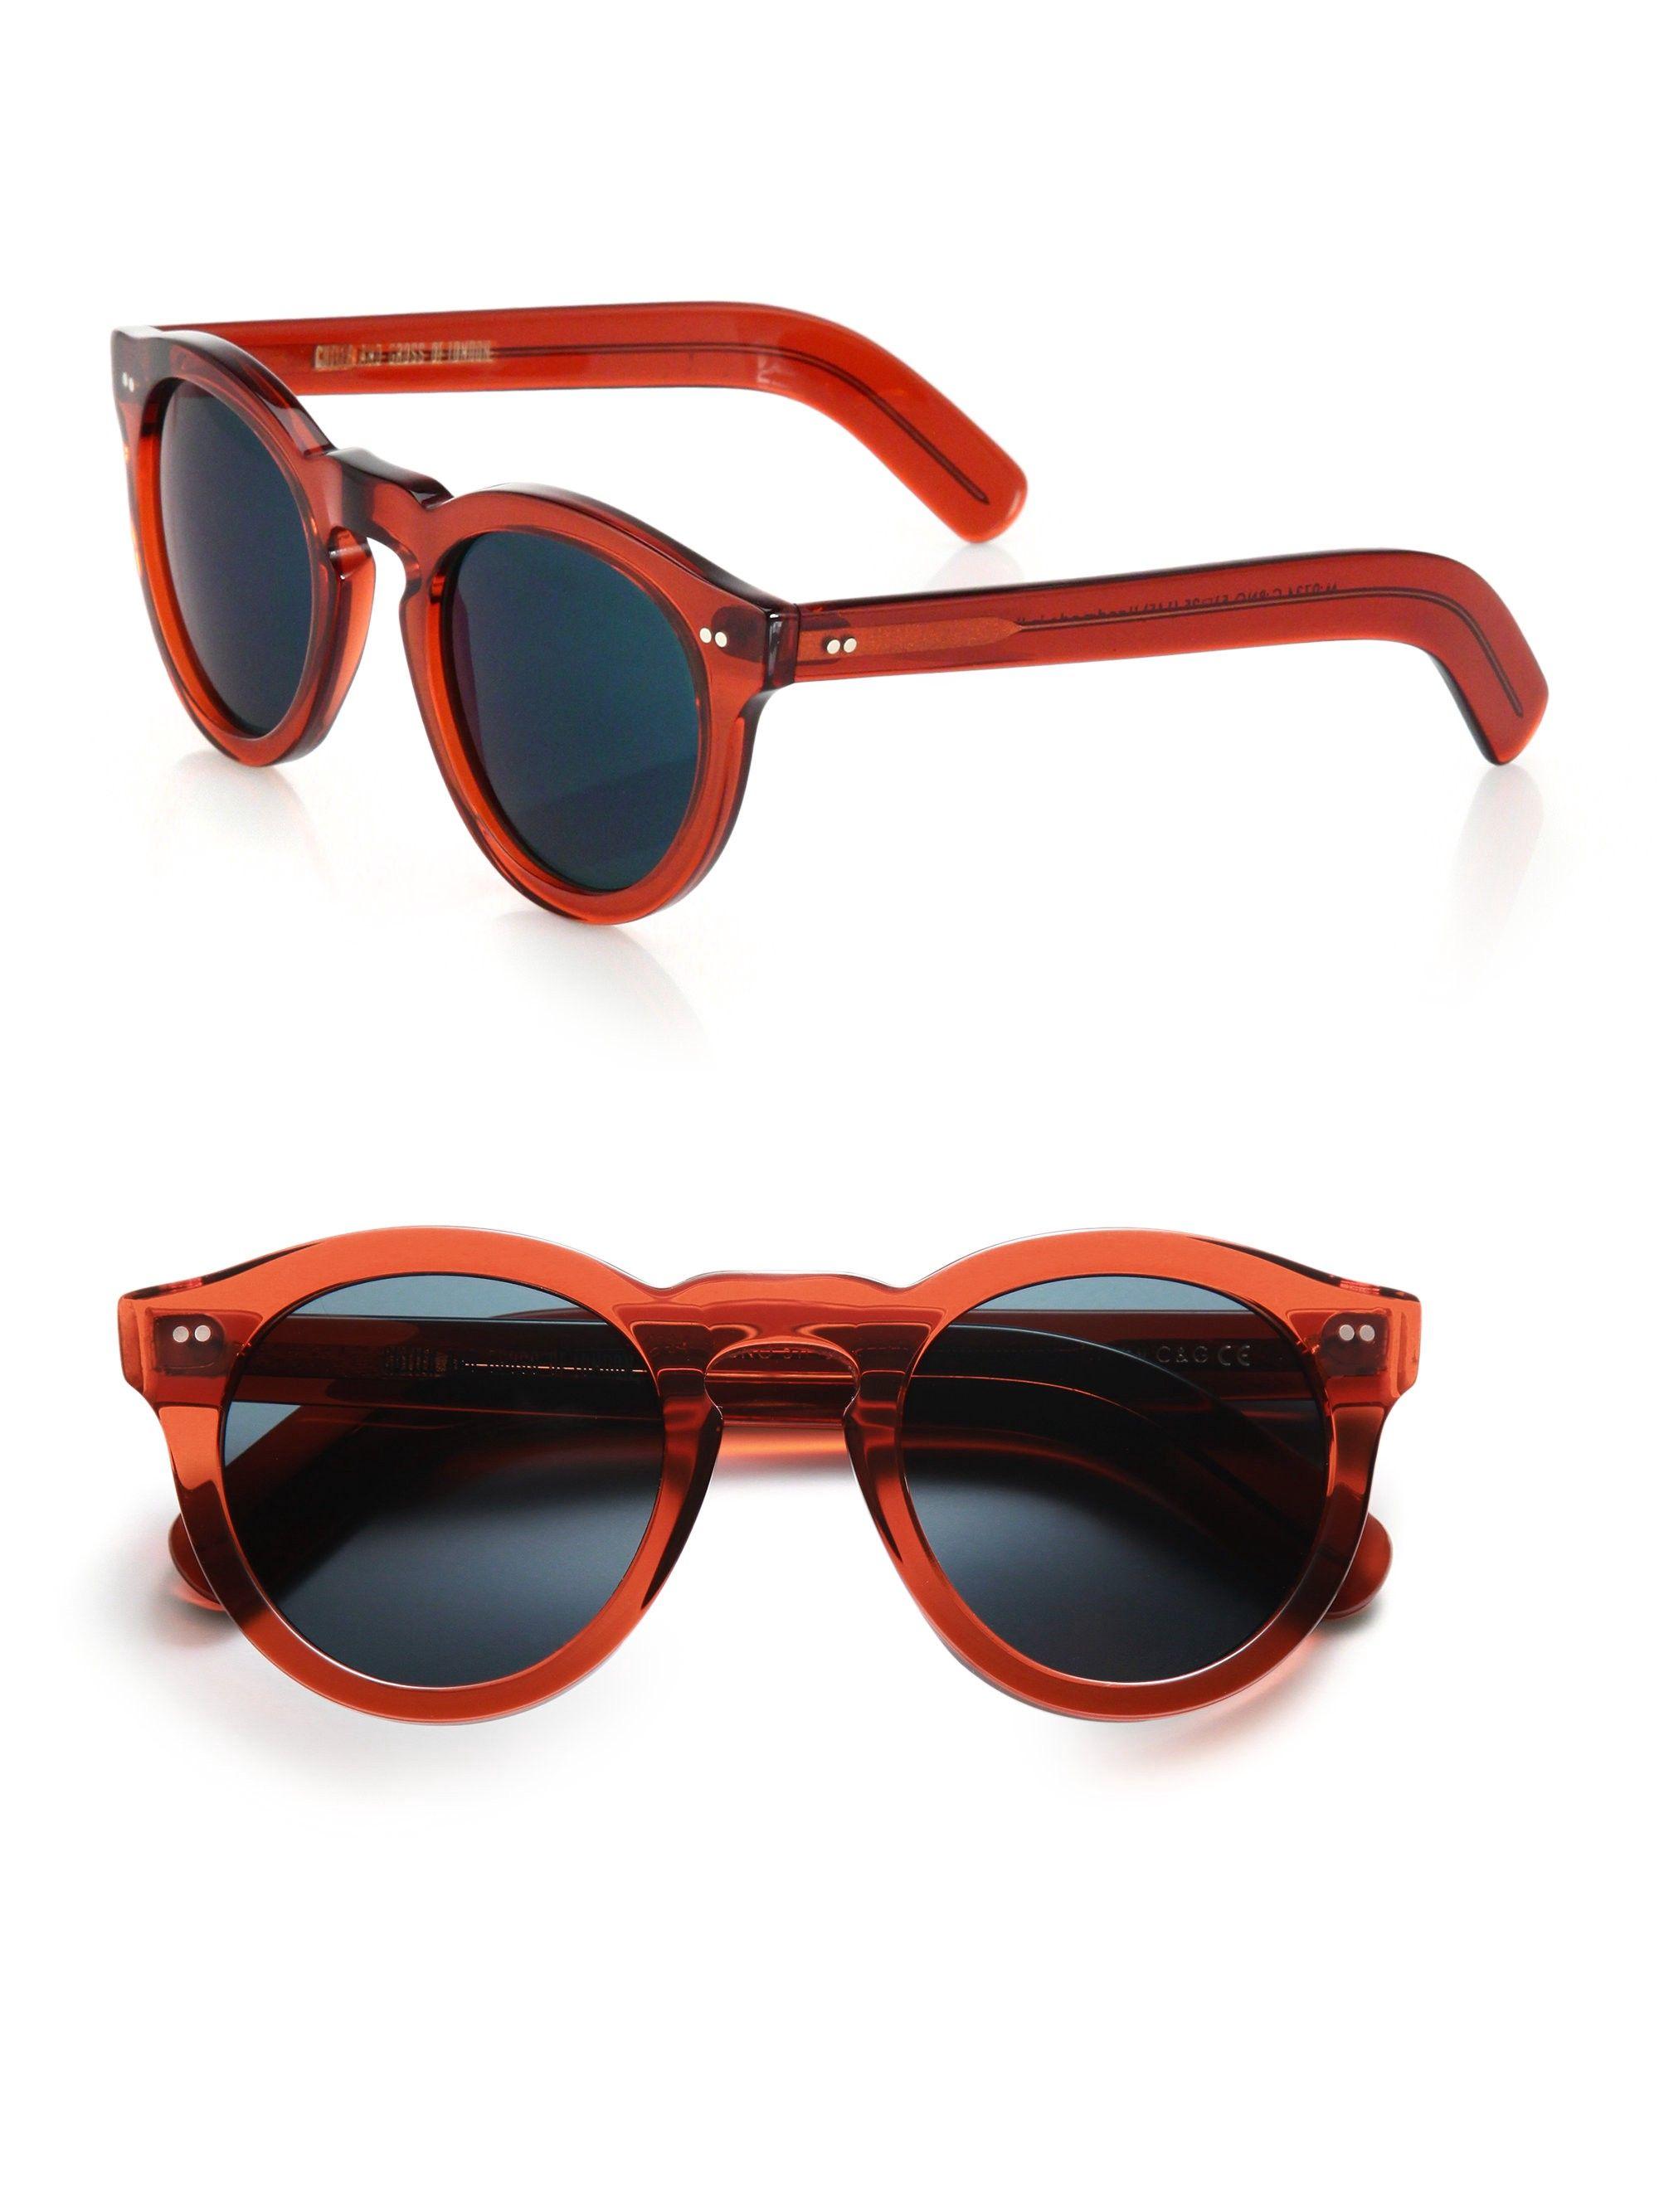 034e6f7ece1 Cutler And Gross Classic 51Mm Round Sunglasses - Bright Orange One ...